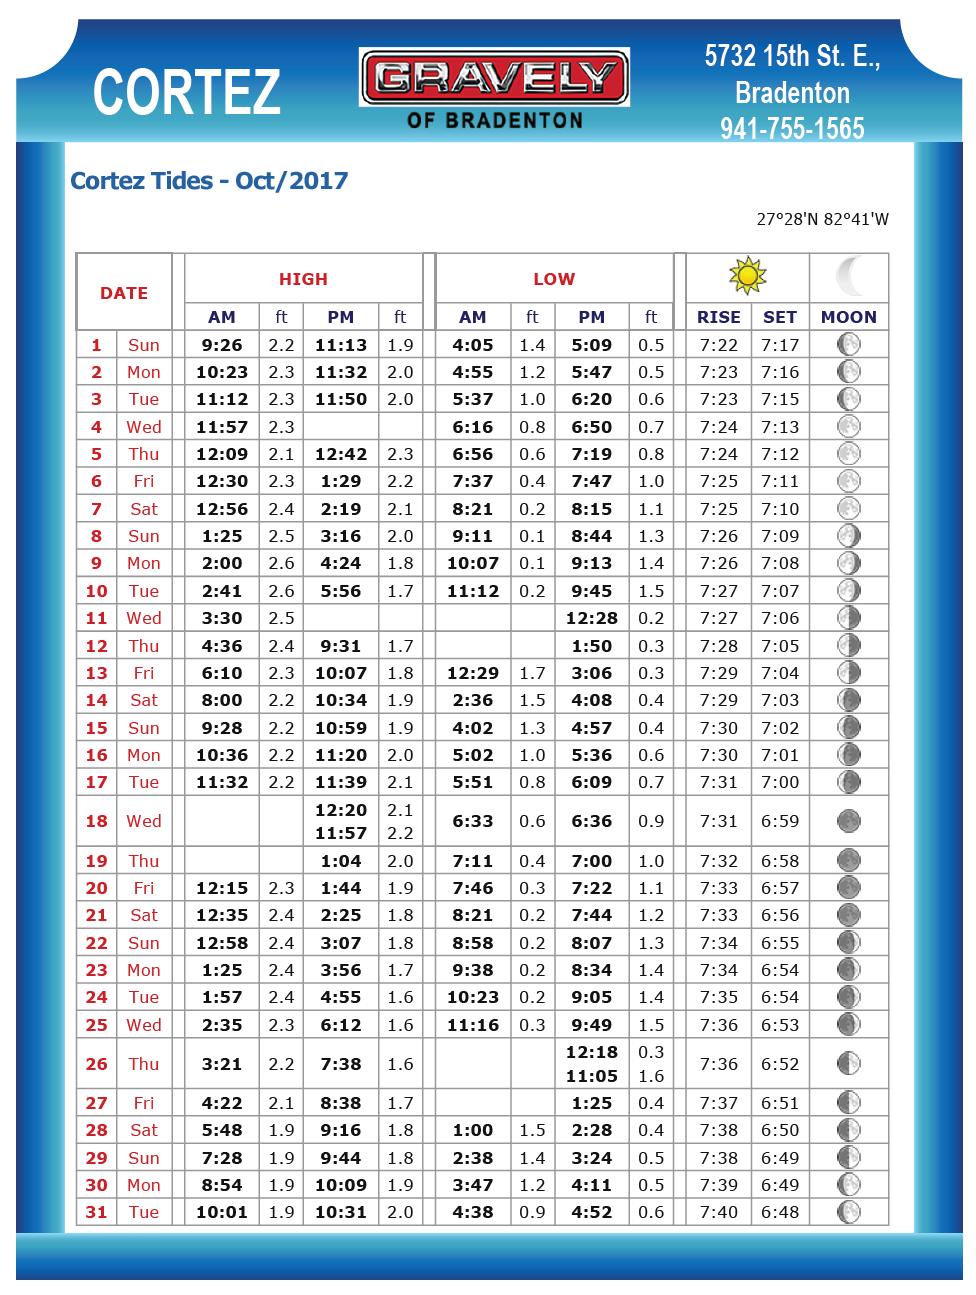 Cortez tide chart oct 2017 coastal angler the angler for Fishing tide charts